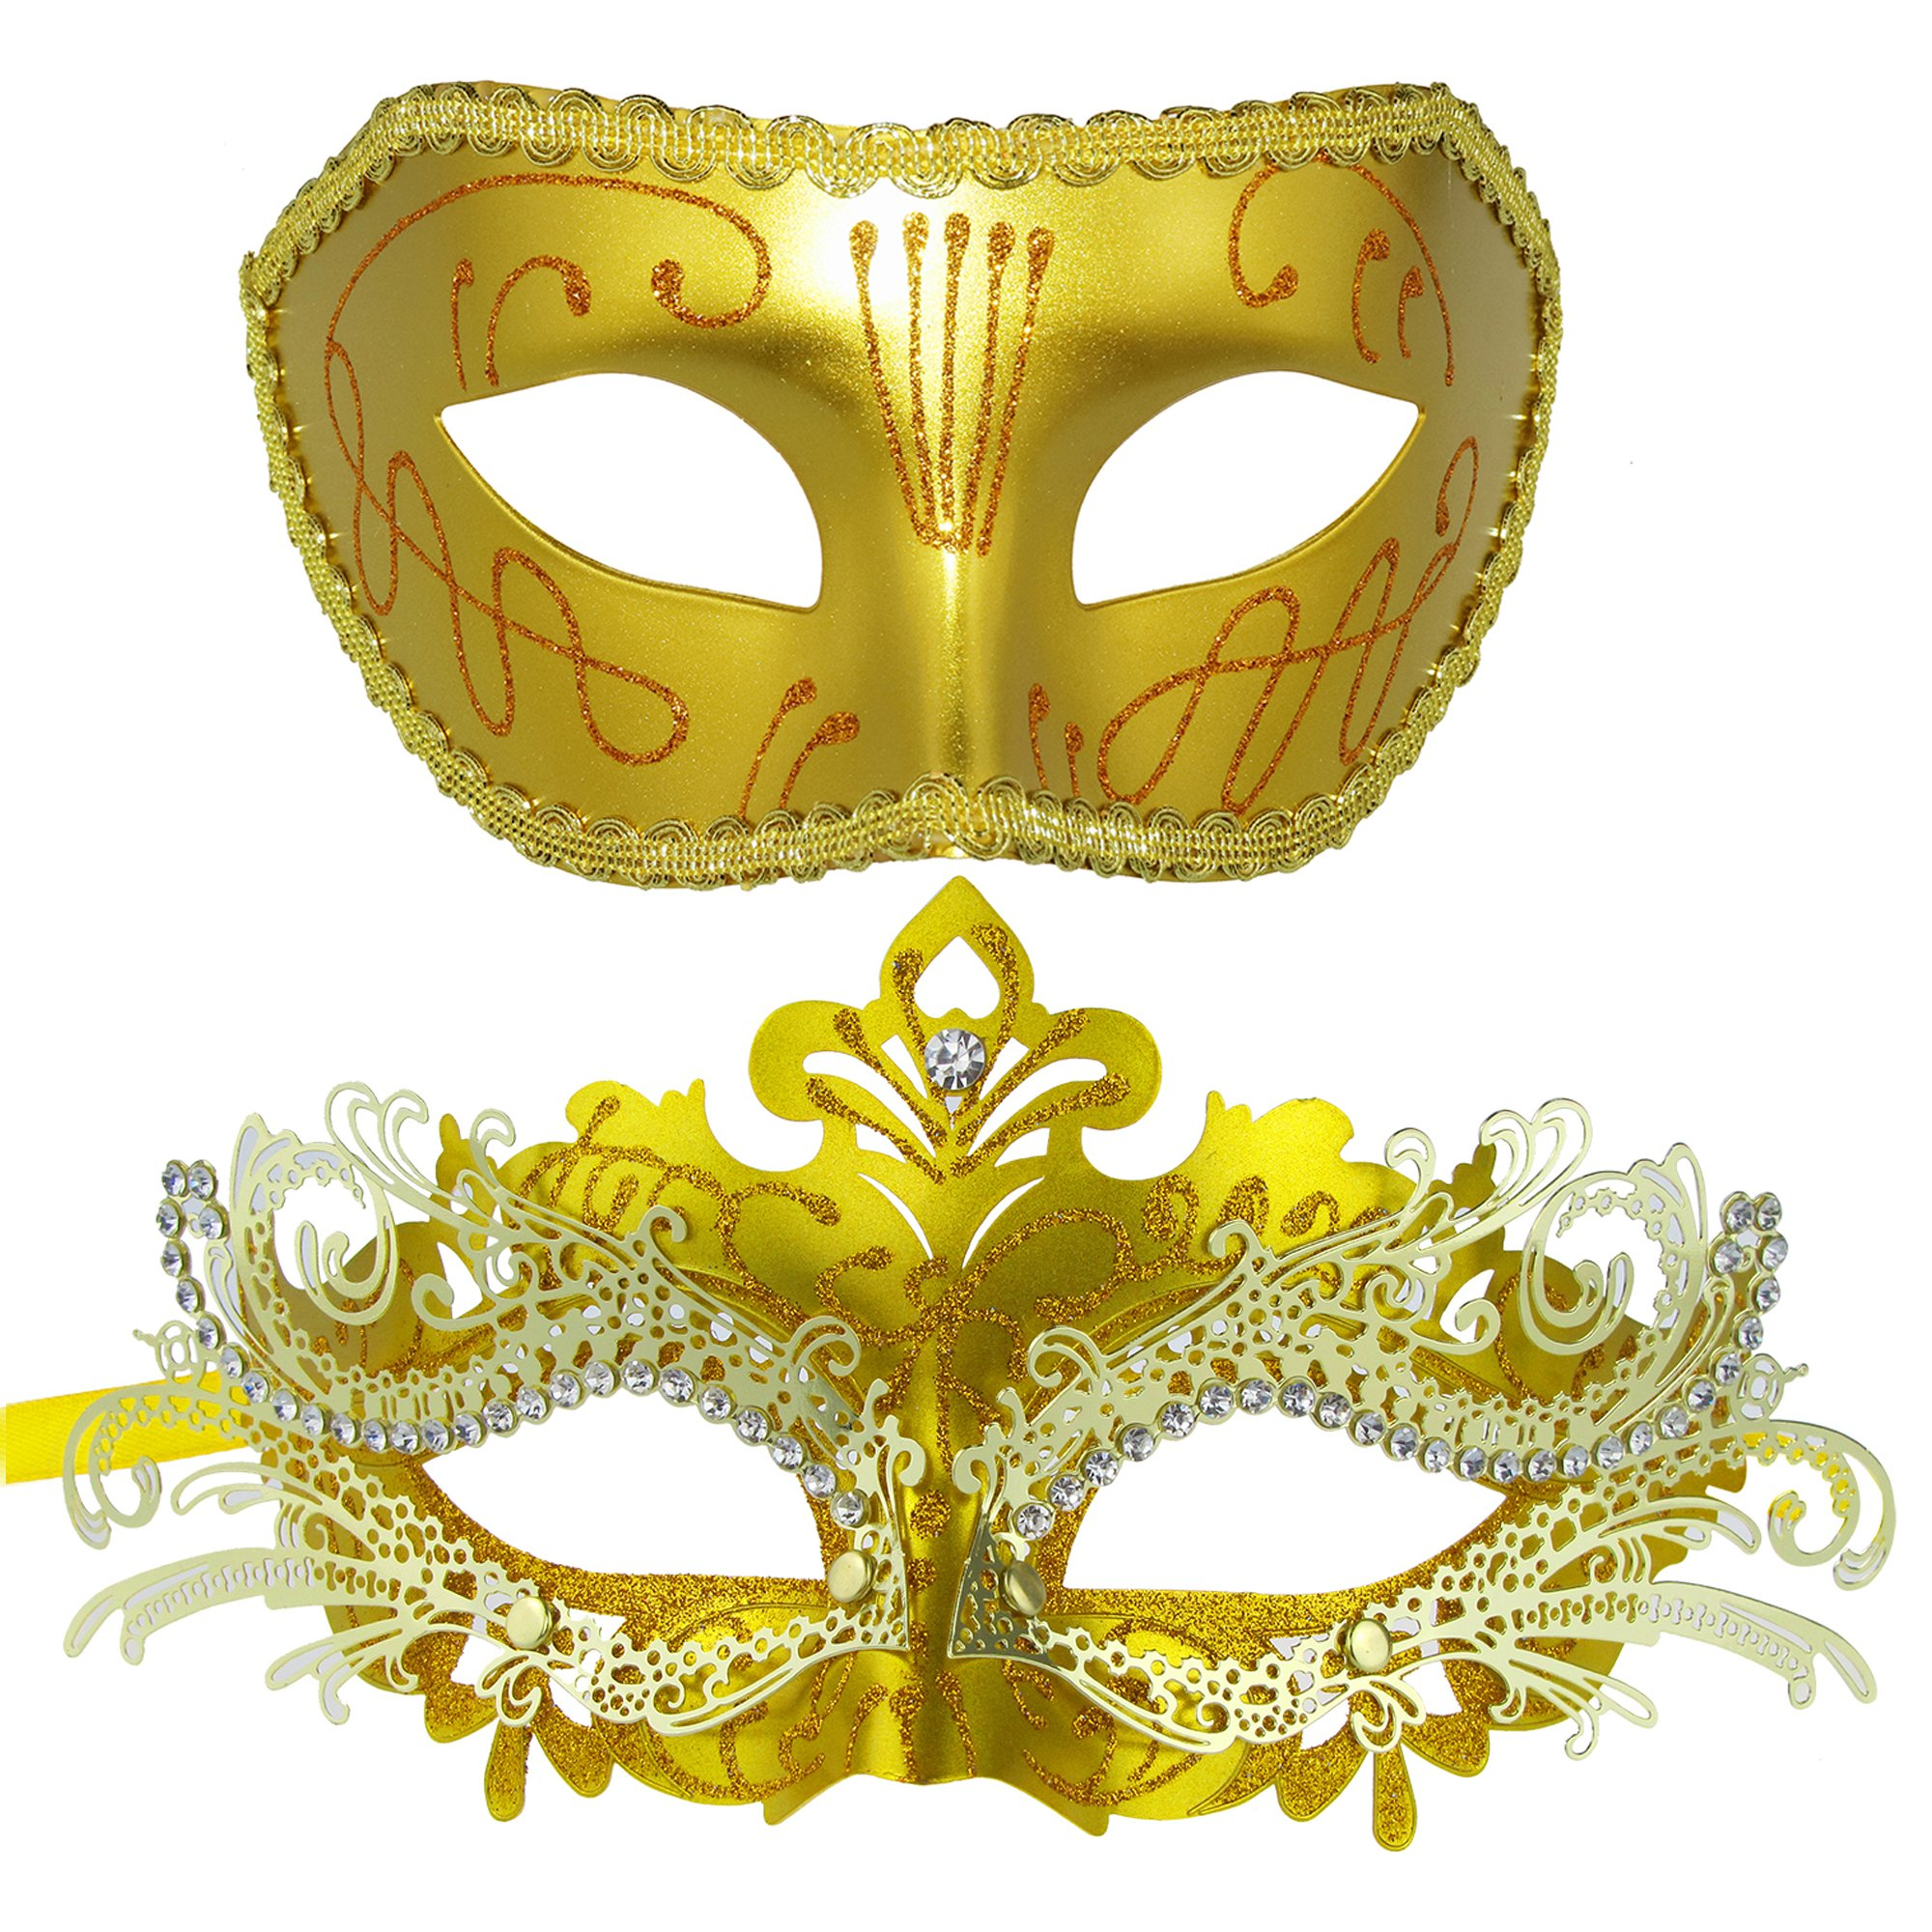 Coddsmz Venetian Pretty Party Evening Prom Mask Masquerade Mask Metal Rhinestone (Gold+Gold)